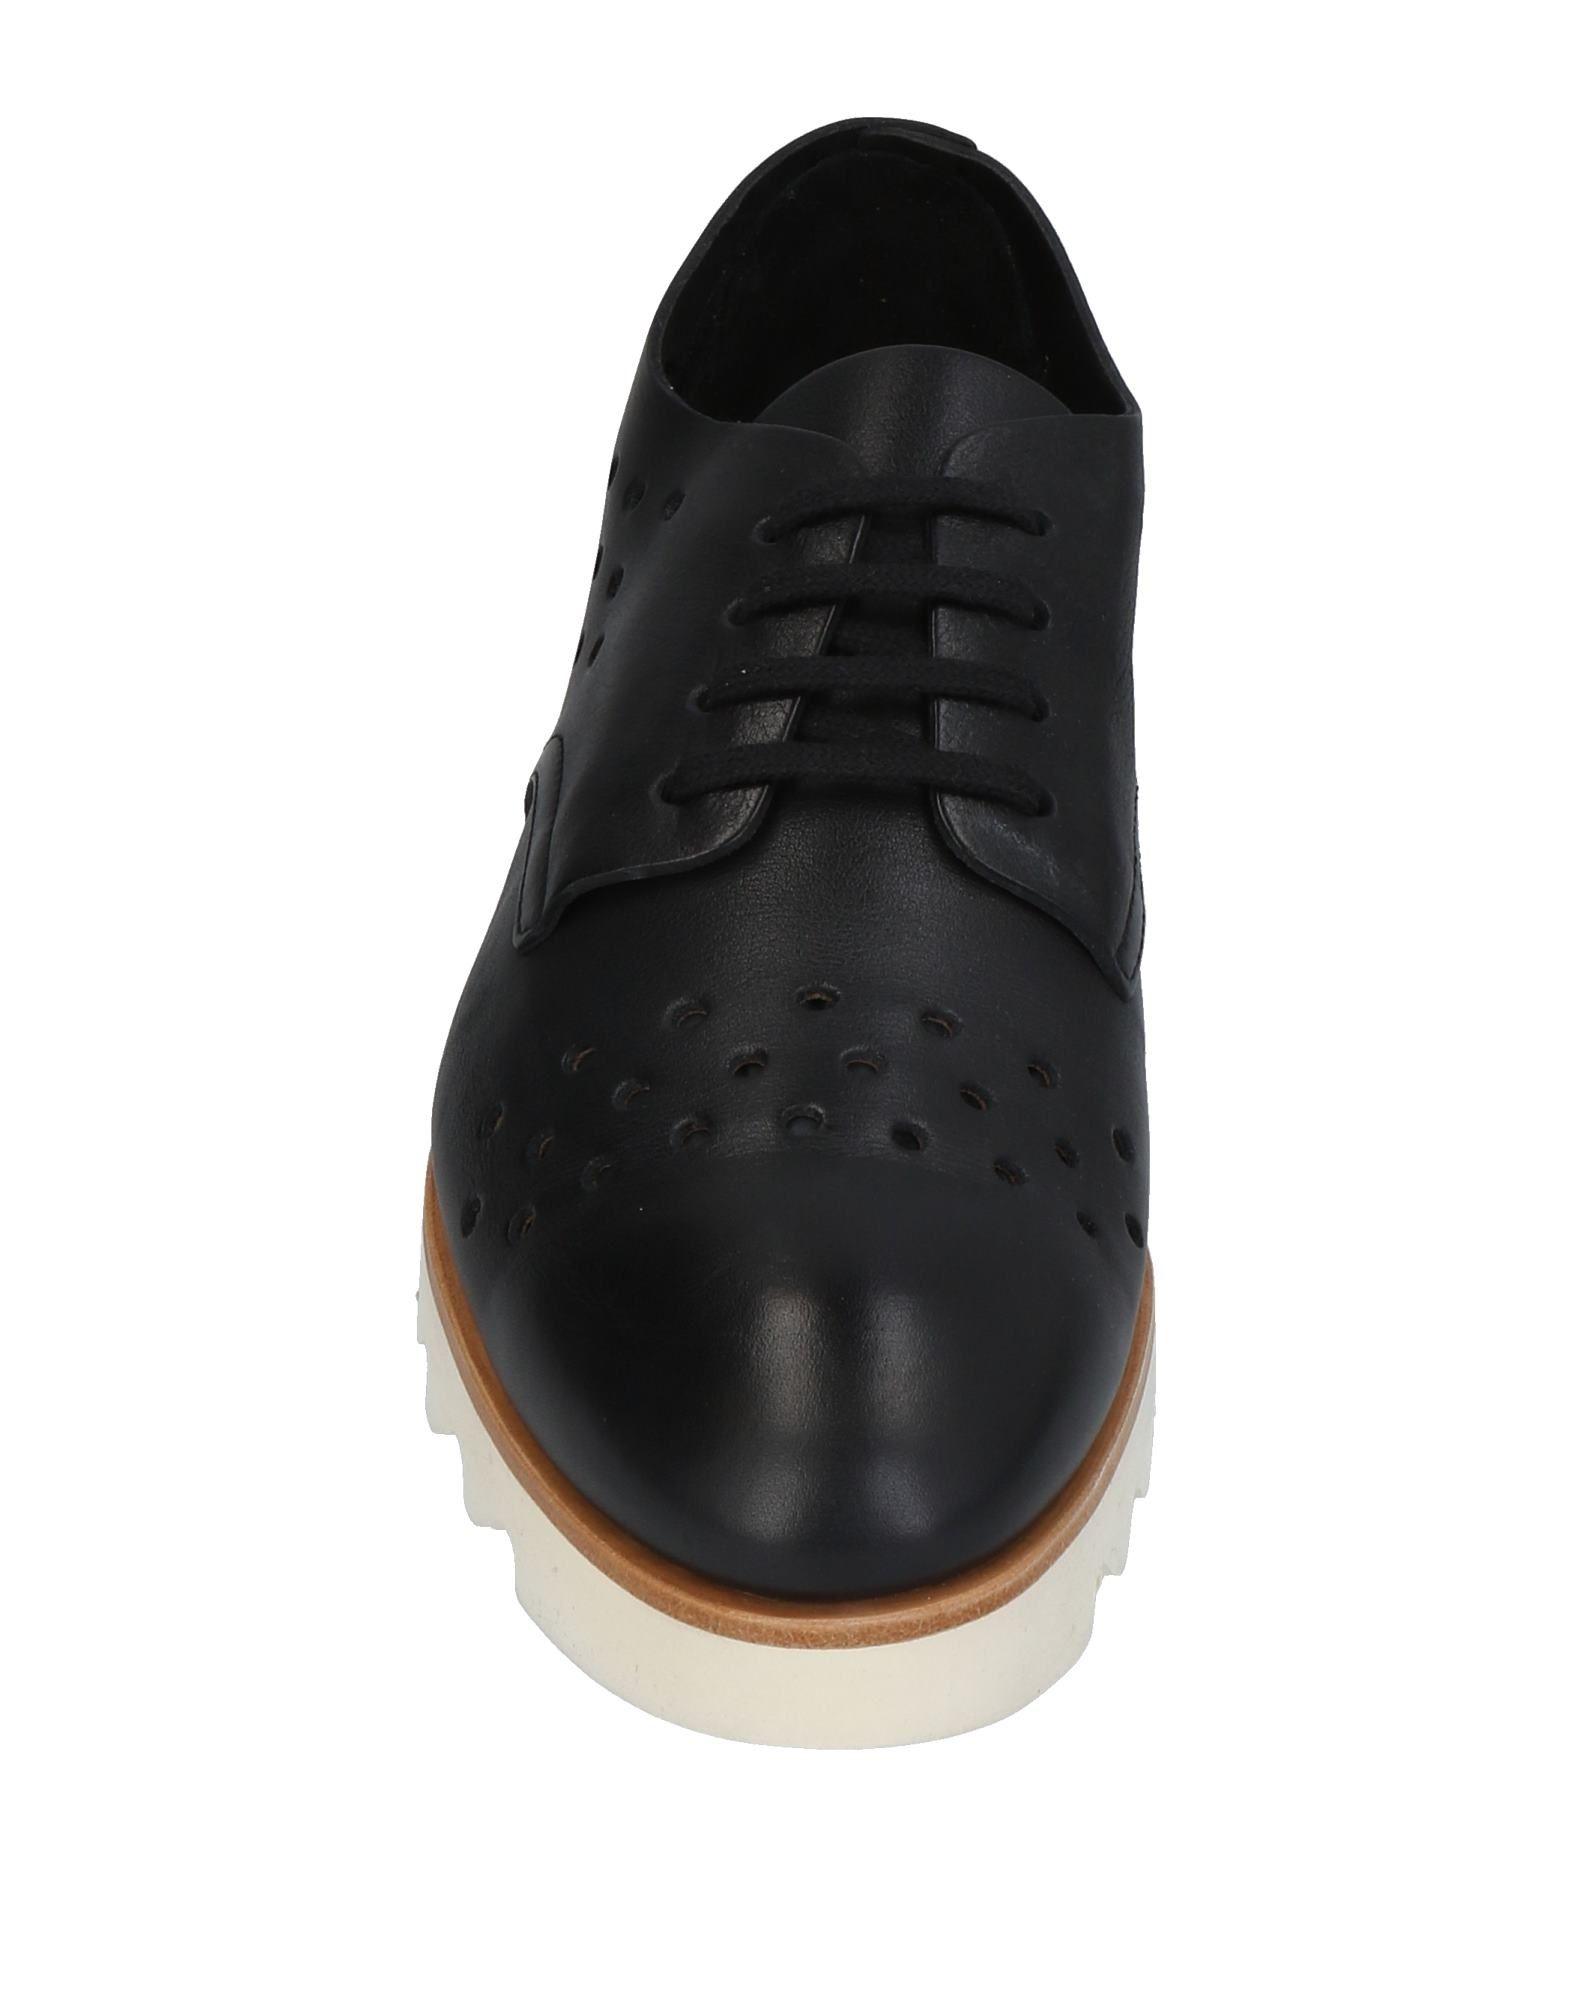 Stilvolle billige Schuhe Barracuda Schnürschuhe Damen  11416096QE